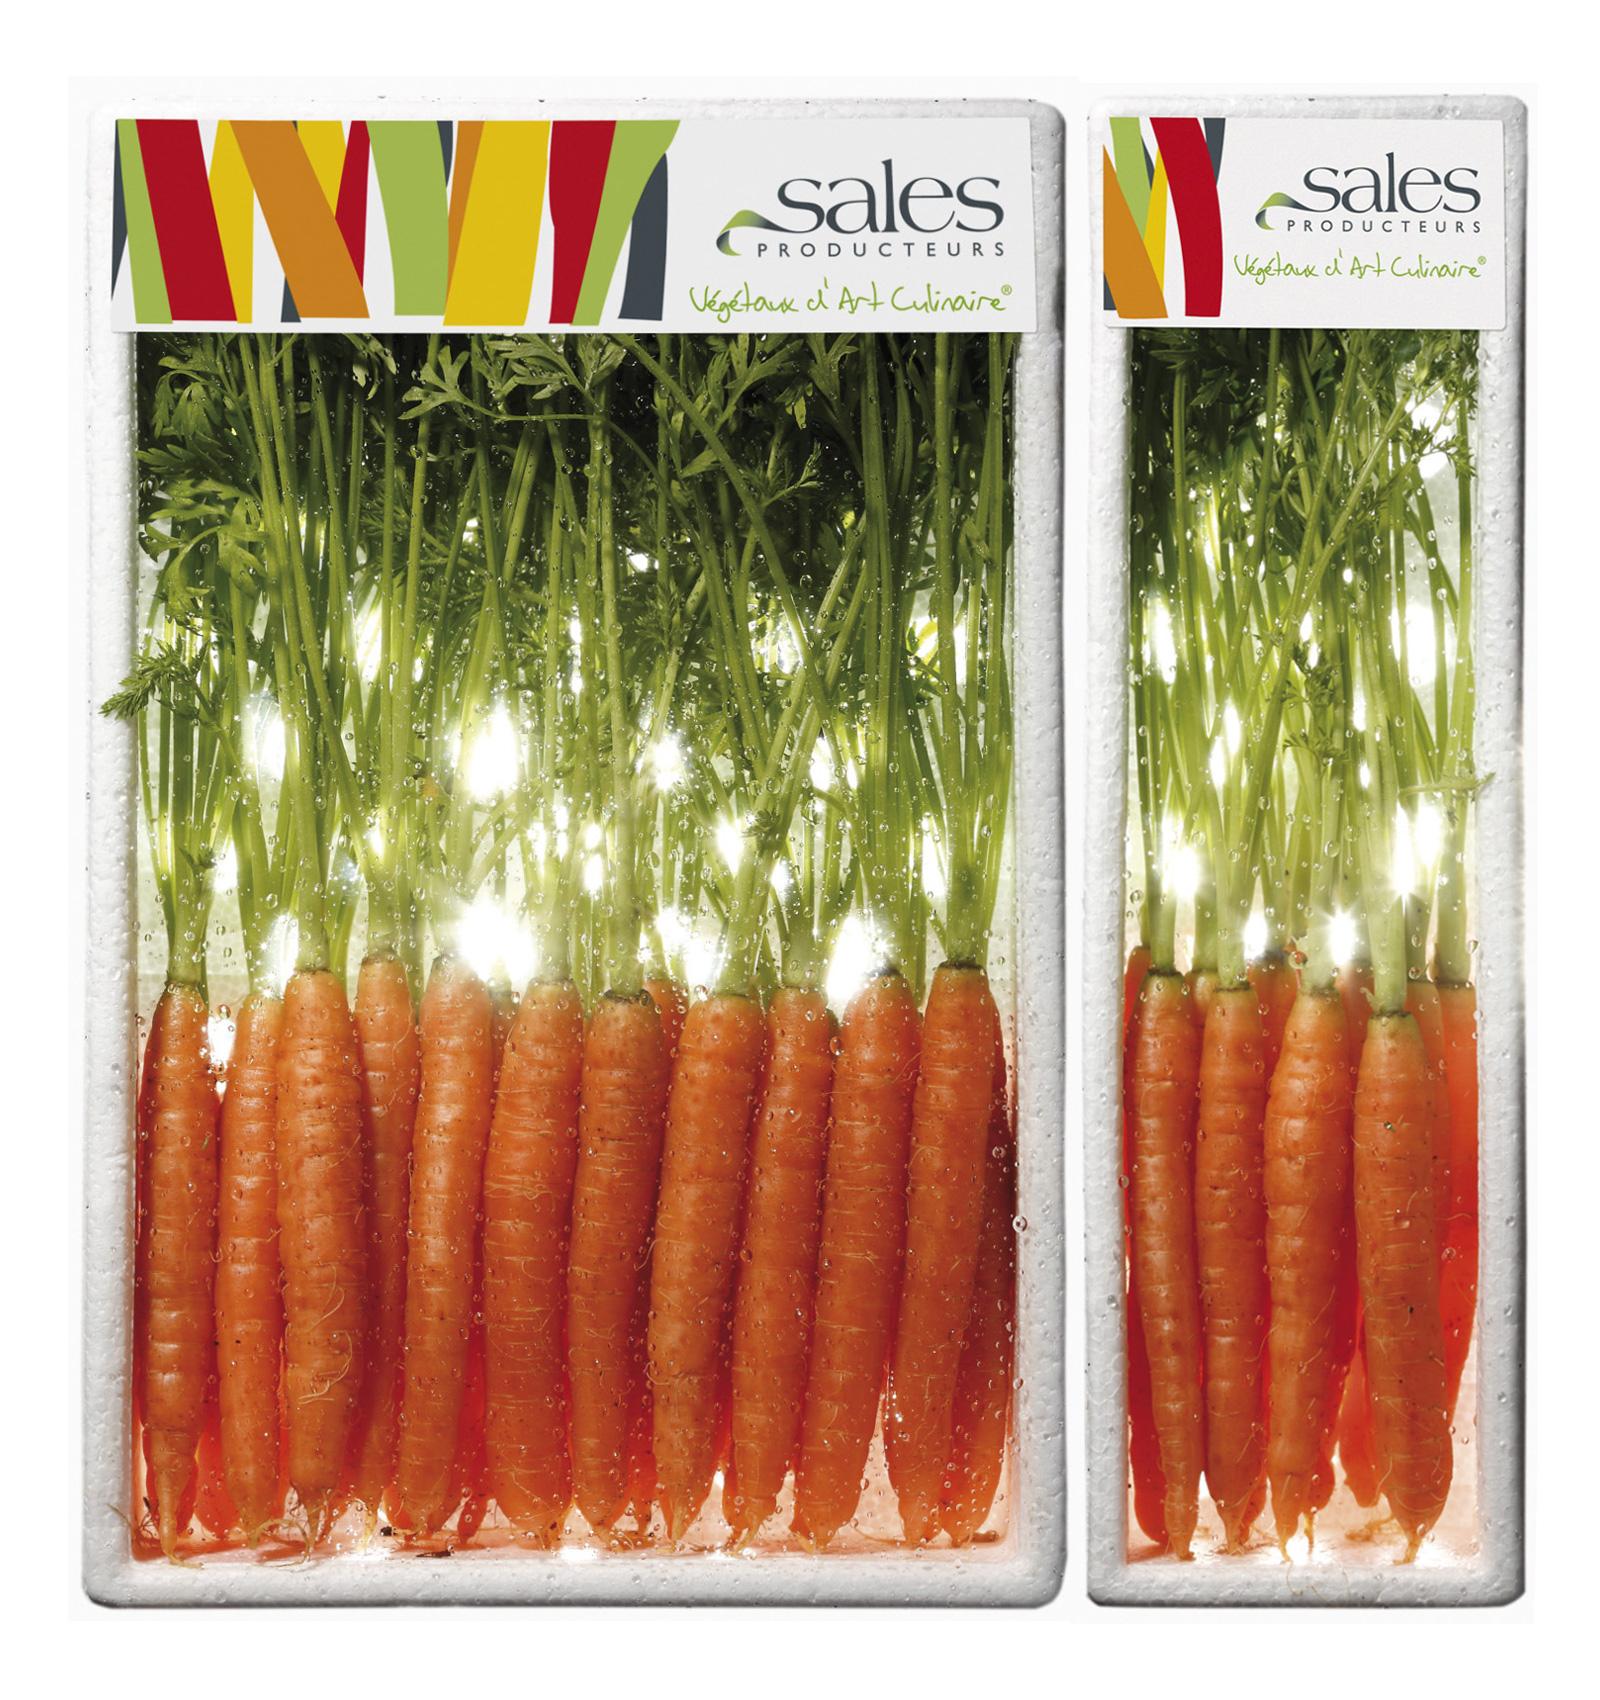 Mini Zanahoria Maison Sales Vegetaux D Art Culinaire Mini Legumes France La zanahoria es una verdura dura, bianual y de clima frío, que crece por la raíz gruesa que produce en. mini zanahoria maison sales